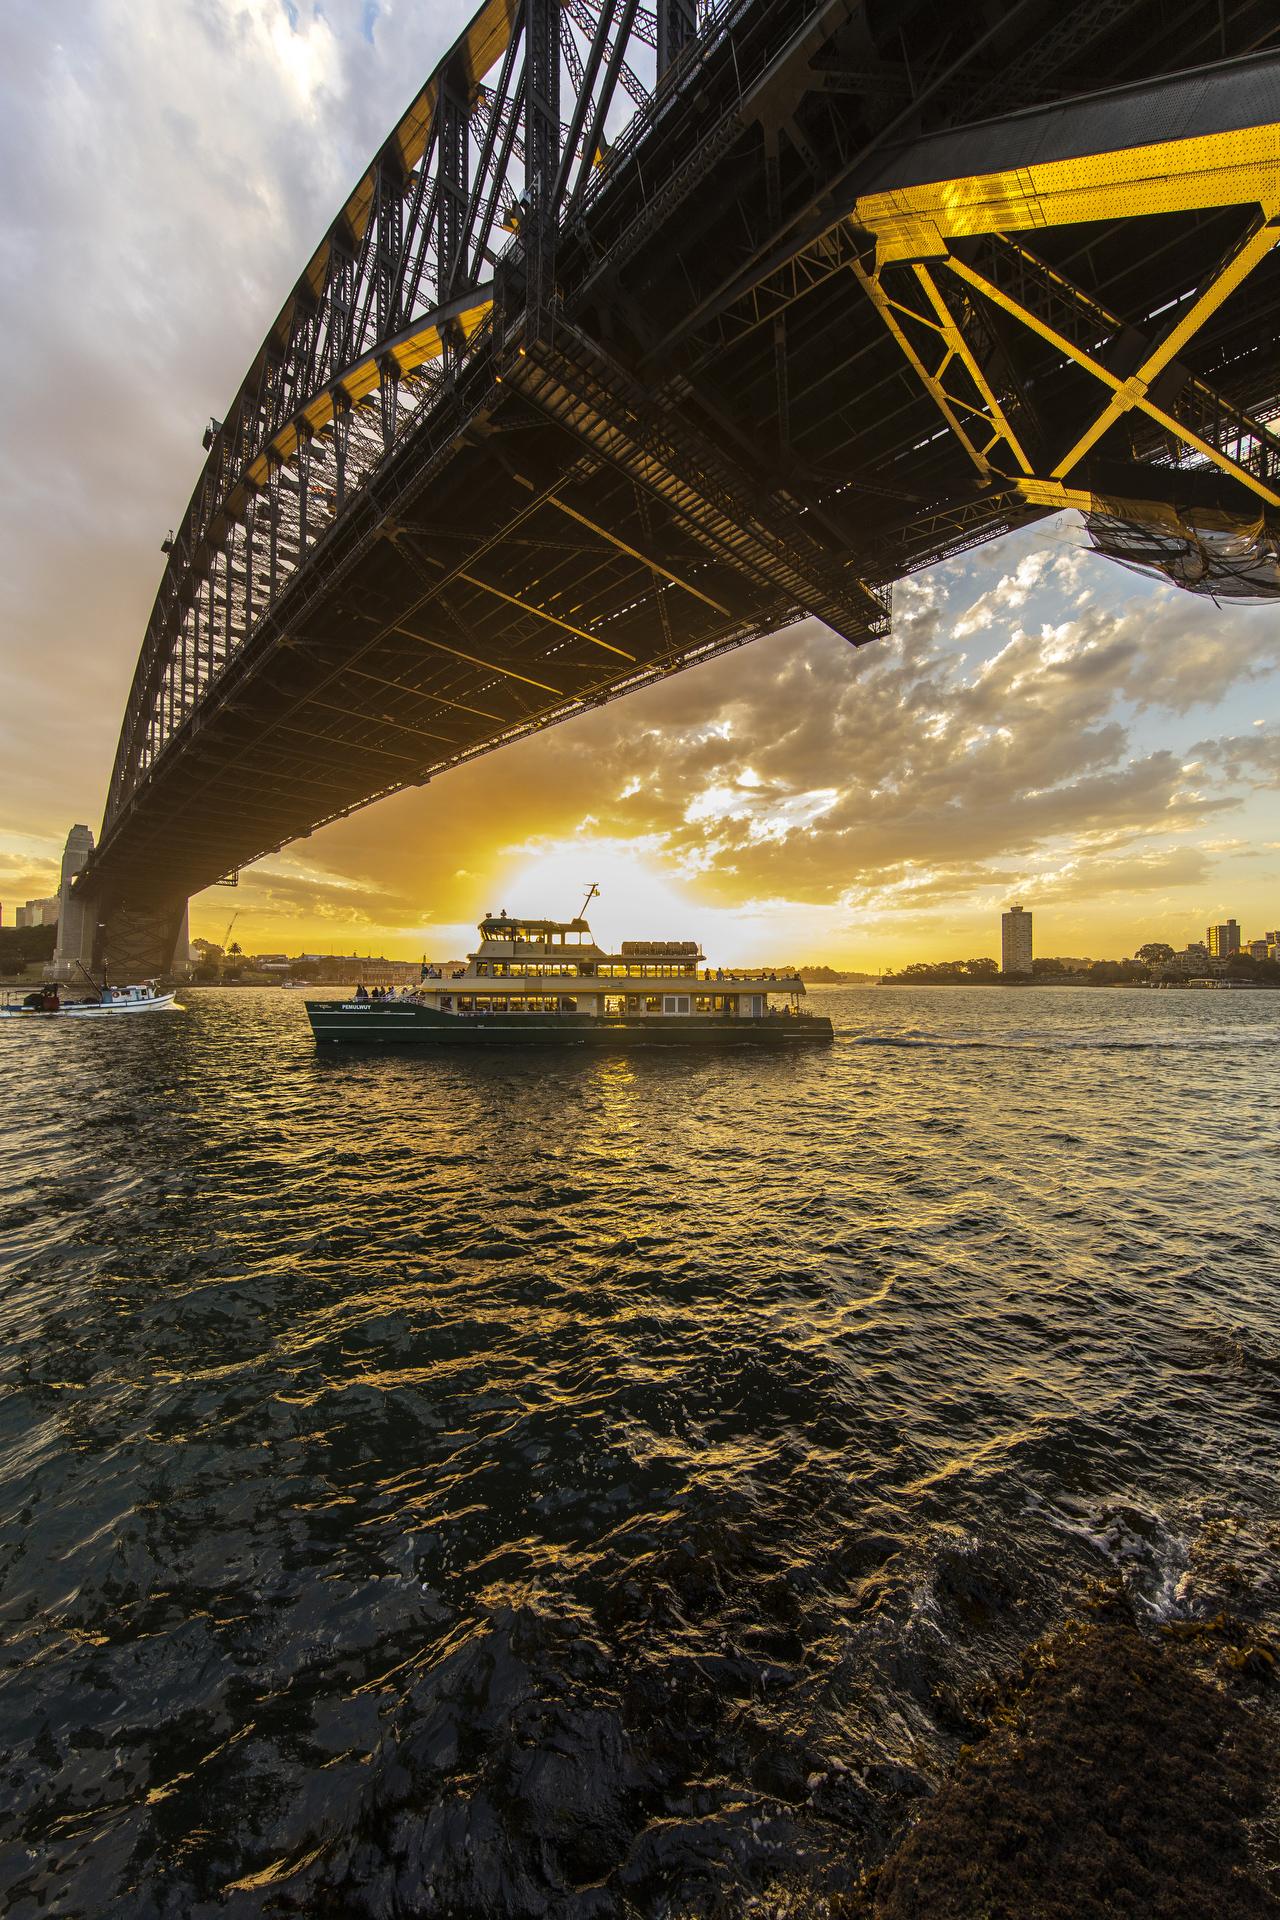 Sydney travel photographer, country, adventure, photo tour, travel photography, destinations, award winning, tips, lessons, Sydney harbur bridge, Ferry, sunset